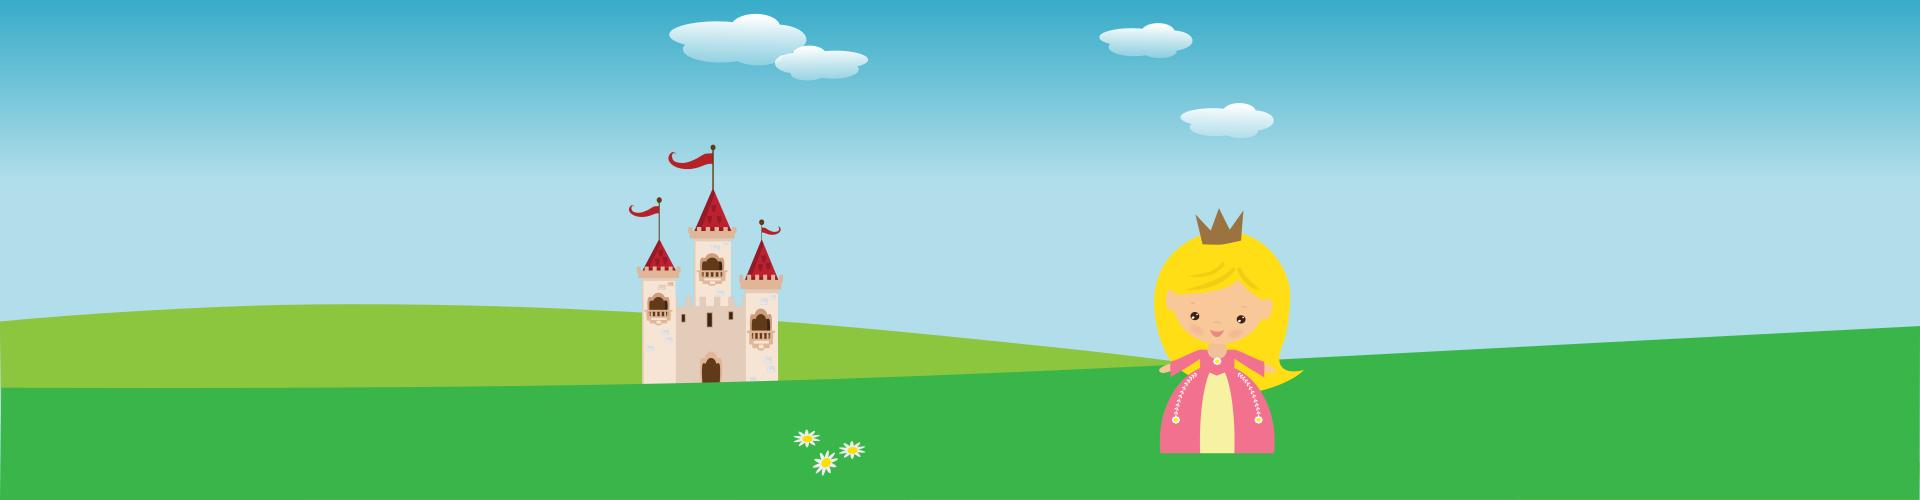 prinsessen speurtocht kinderfeestje - print je feestje